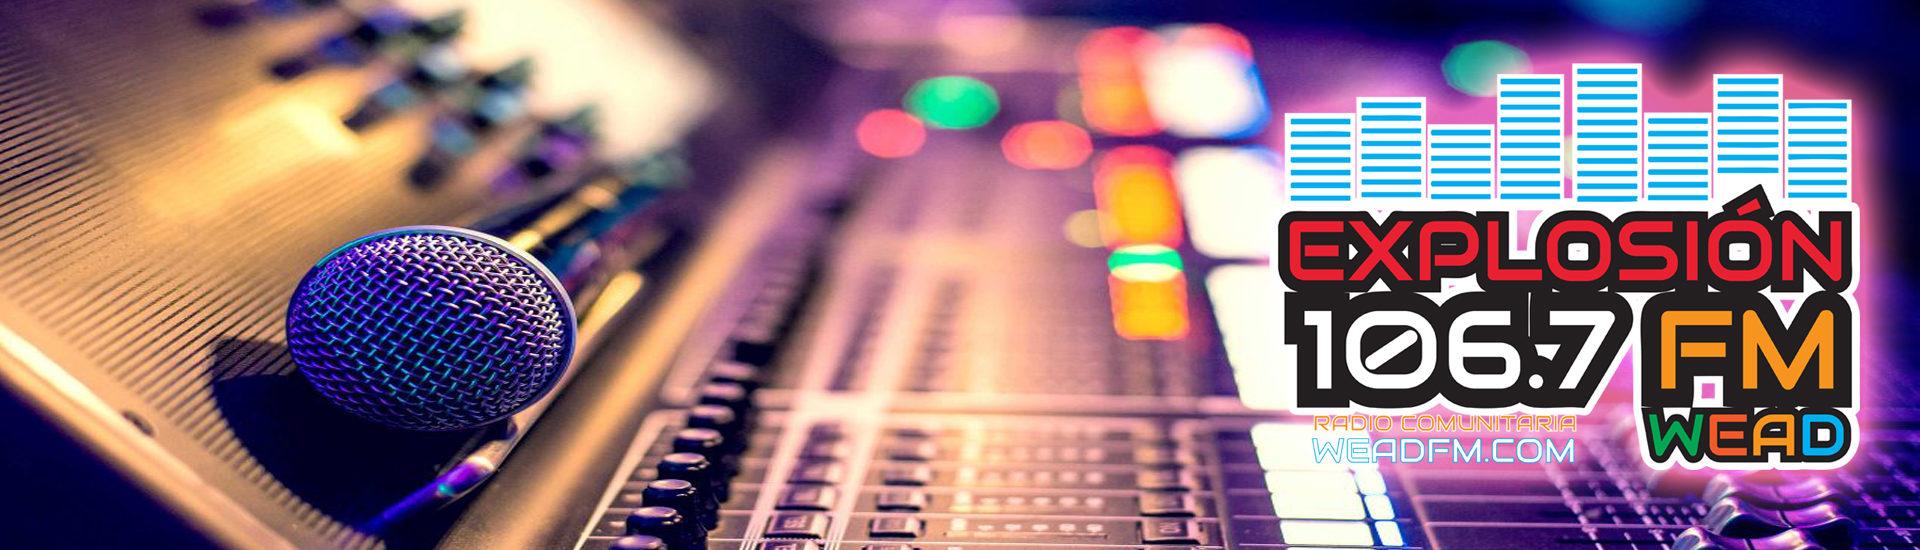 Explosion 106.7 FM – WEAD